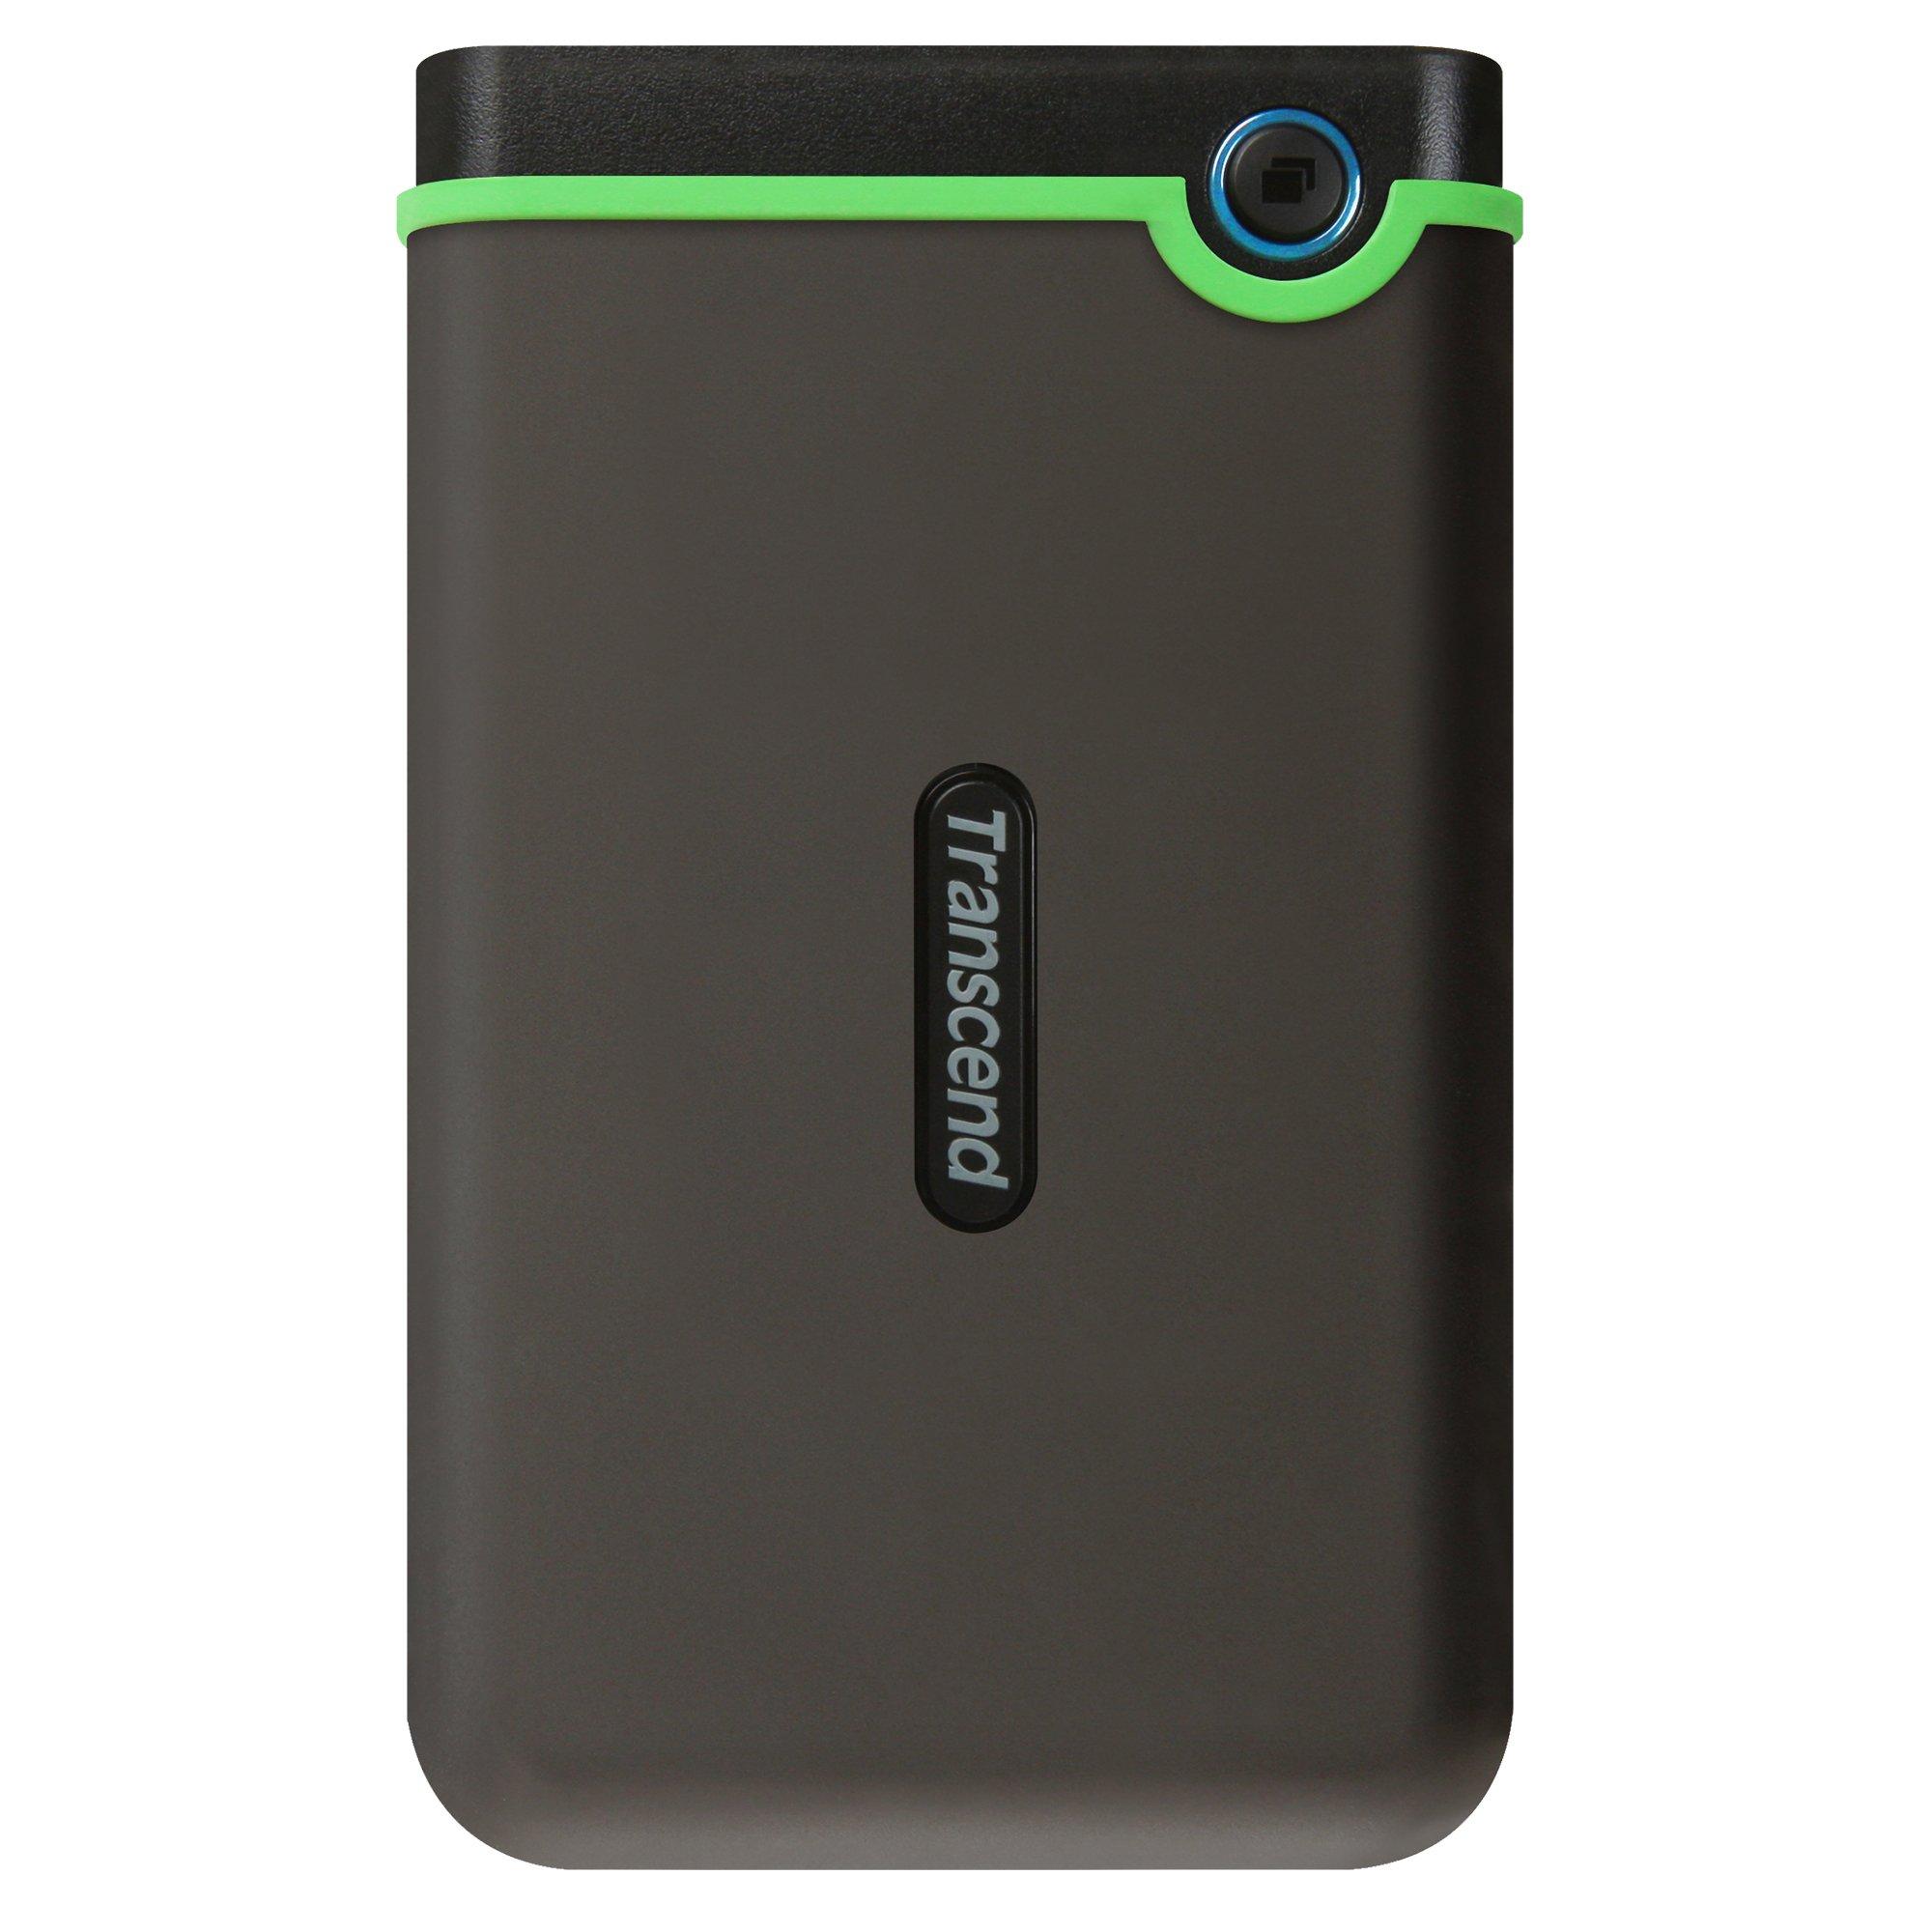 Transcend StoreJet 25M3S - Disco duro externo de 2 TB (USB 3.1 Gen 1)